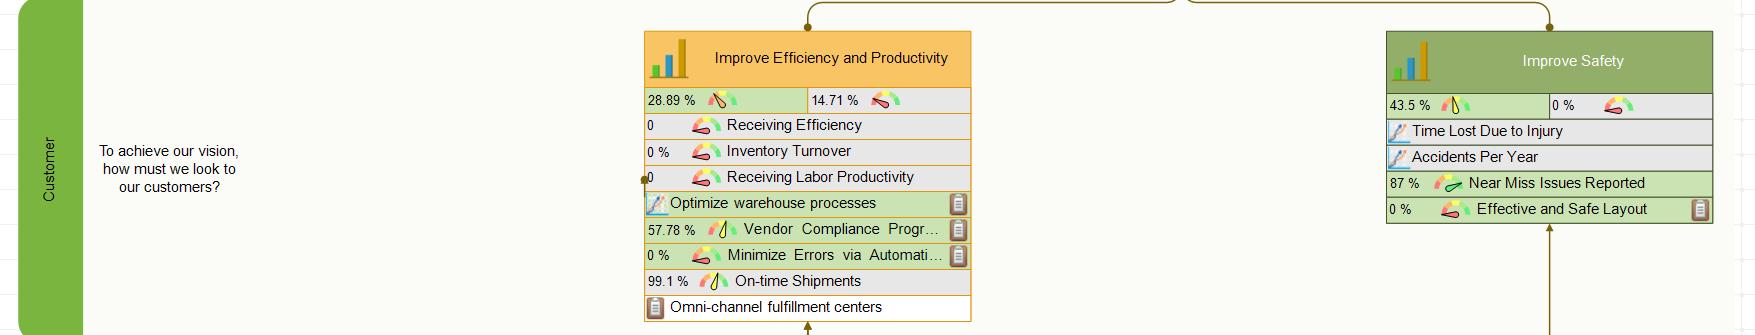 Warehouse scorecard - Customer Perspective